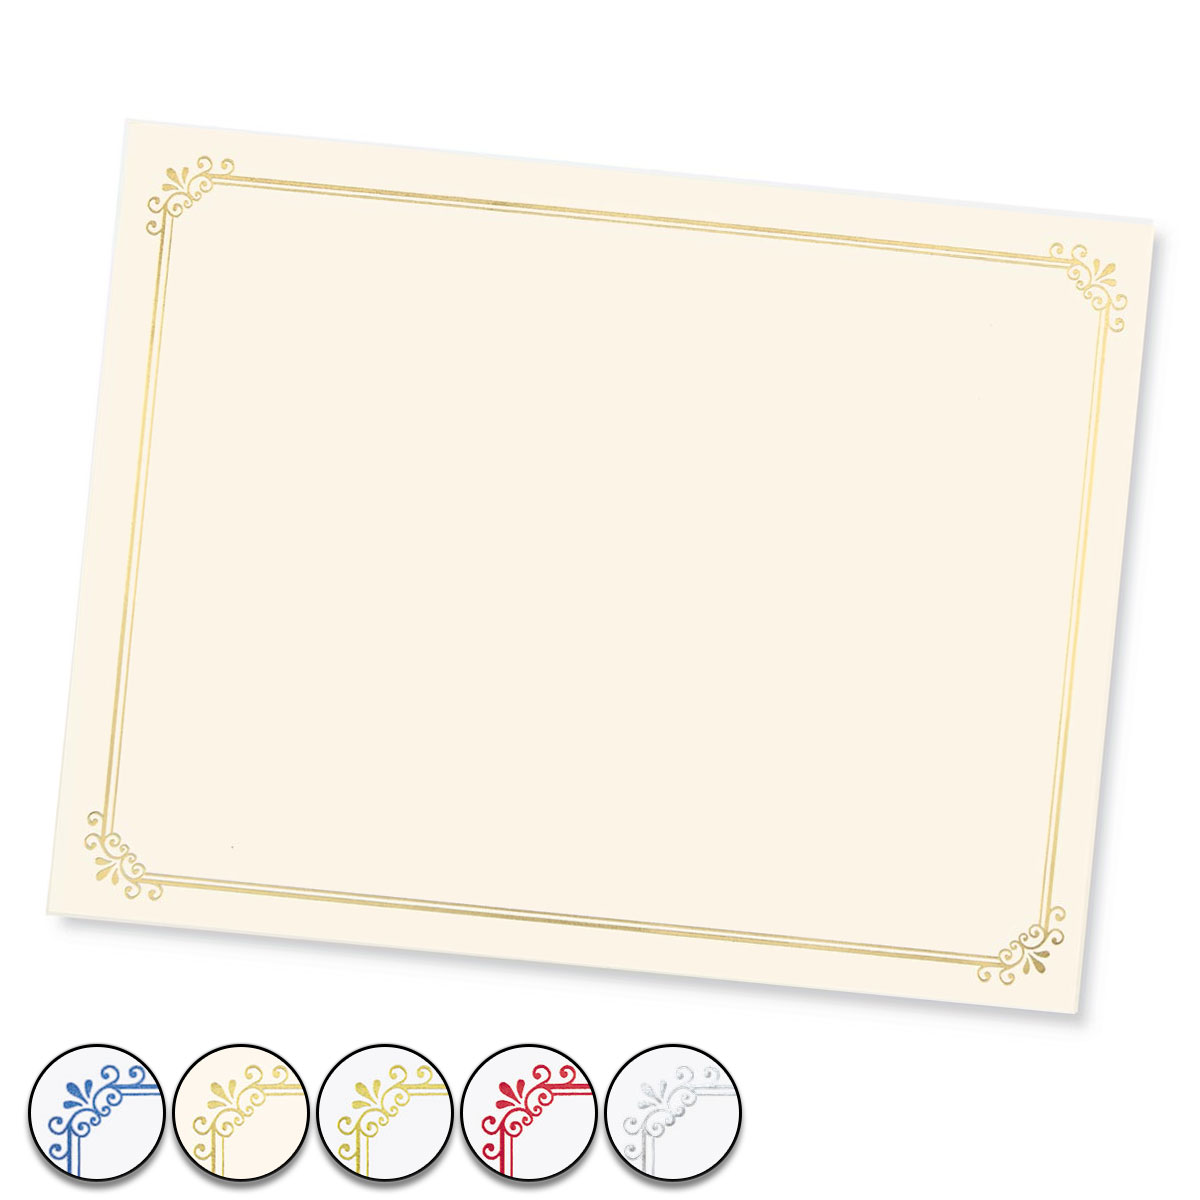 simple border specialty certificates paperdirect s